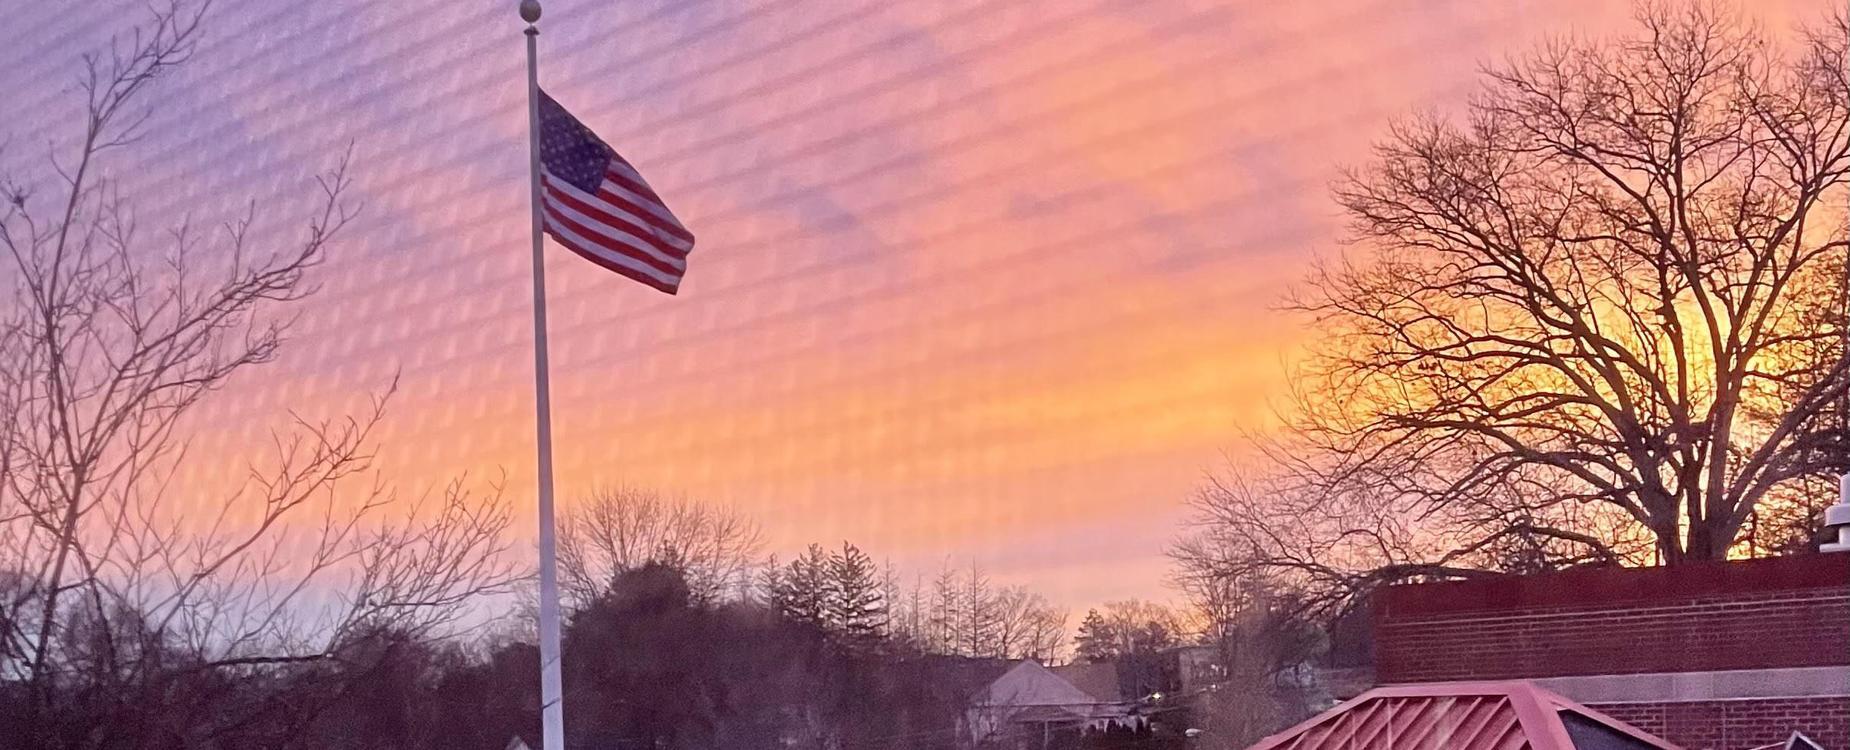 Sunrise over West Street Elementary School